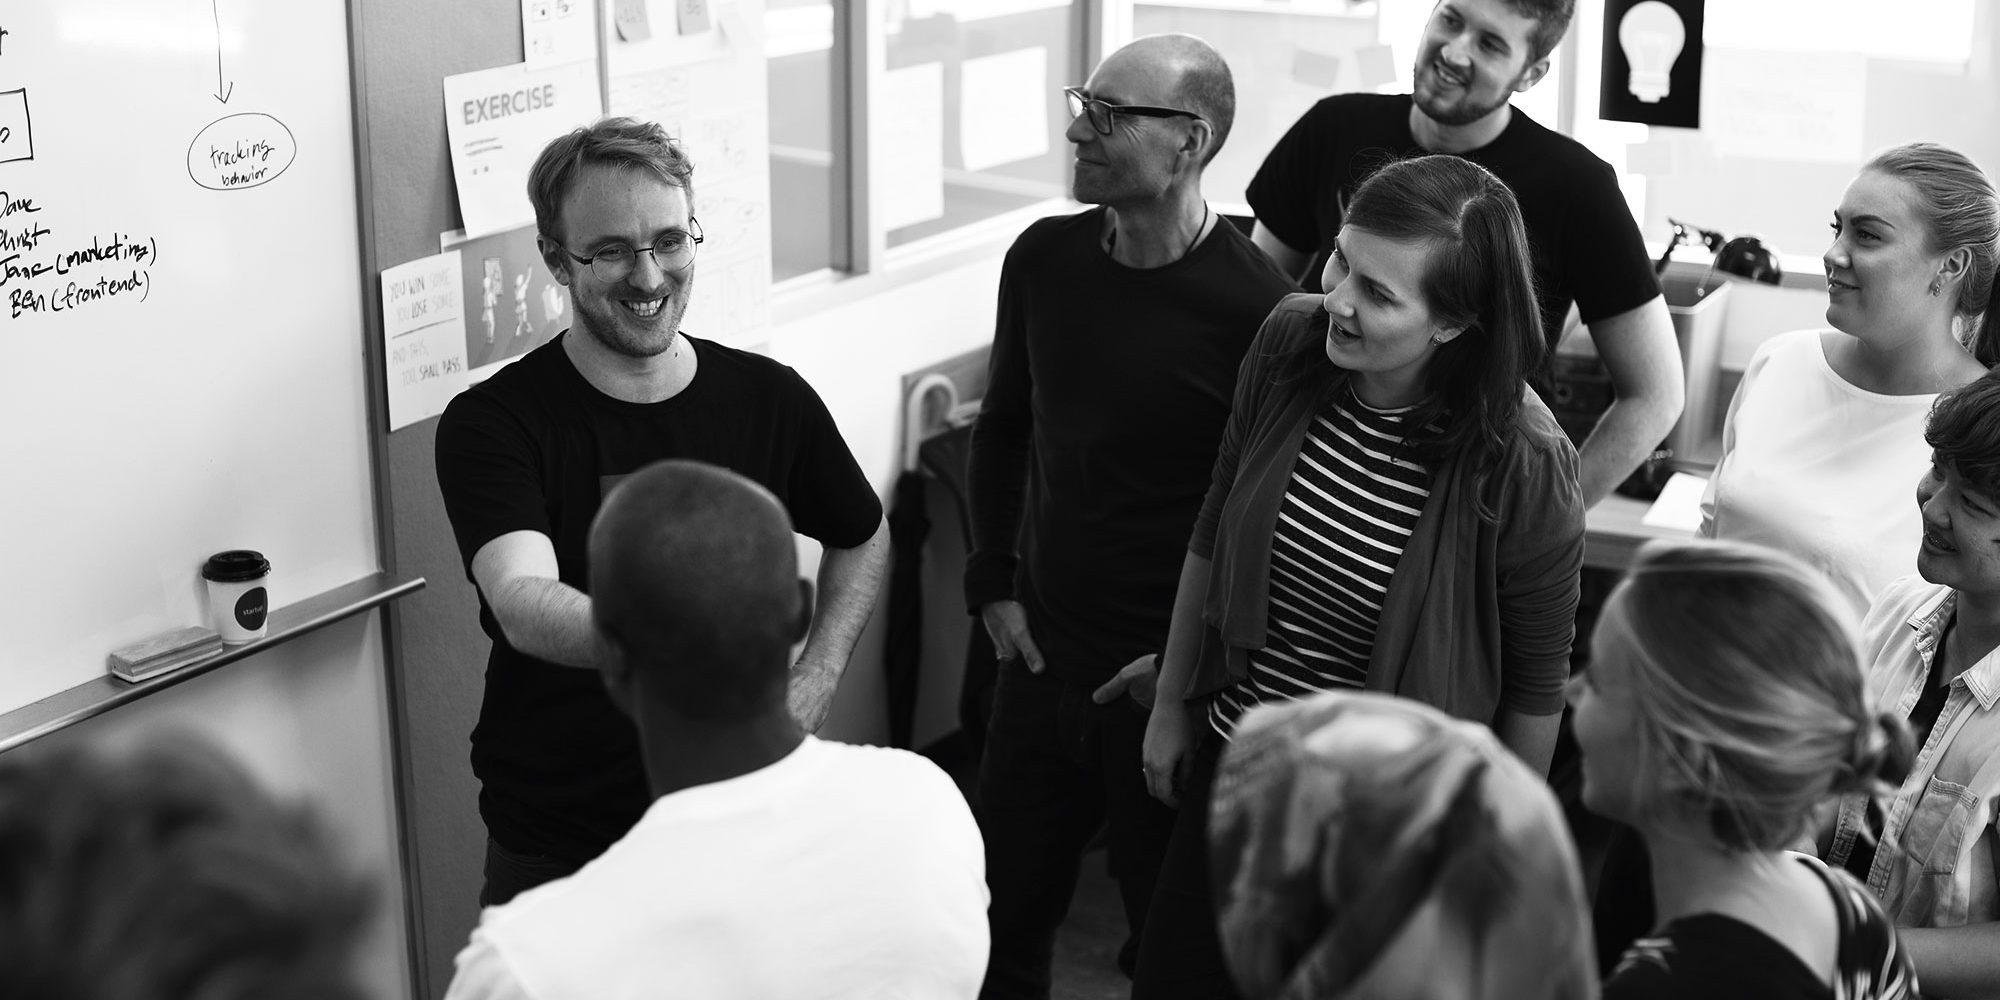 startup-business-team-brainstorming-on-meeting-wor-PJQM2HH.jpg